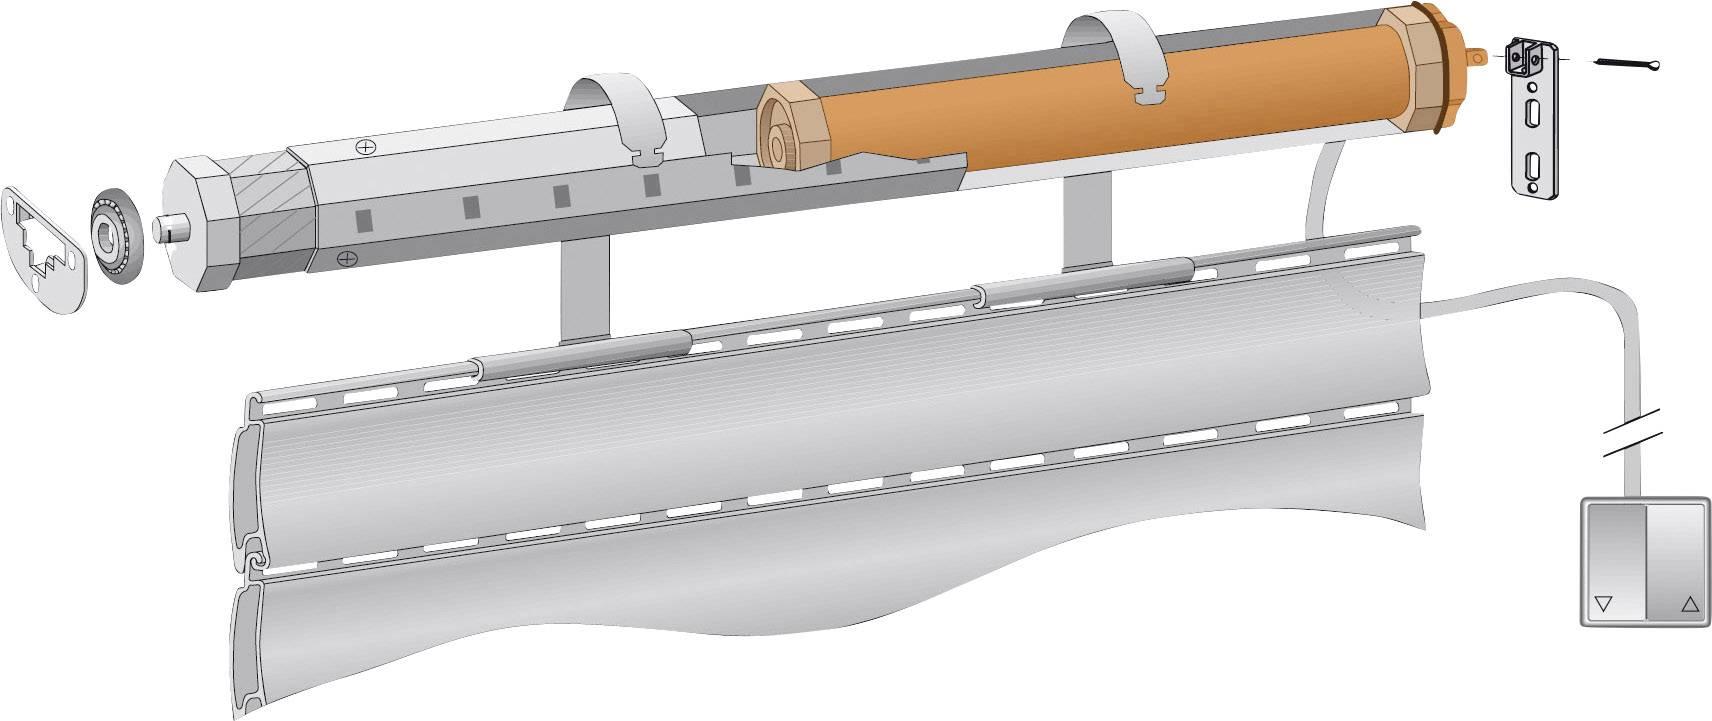 Trubkový motor Kaiser Nienhaus Favorit Electronic 122000, 20 Nm, 121000, ťah 5,5 m2